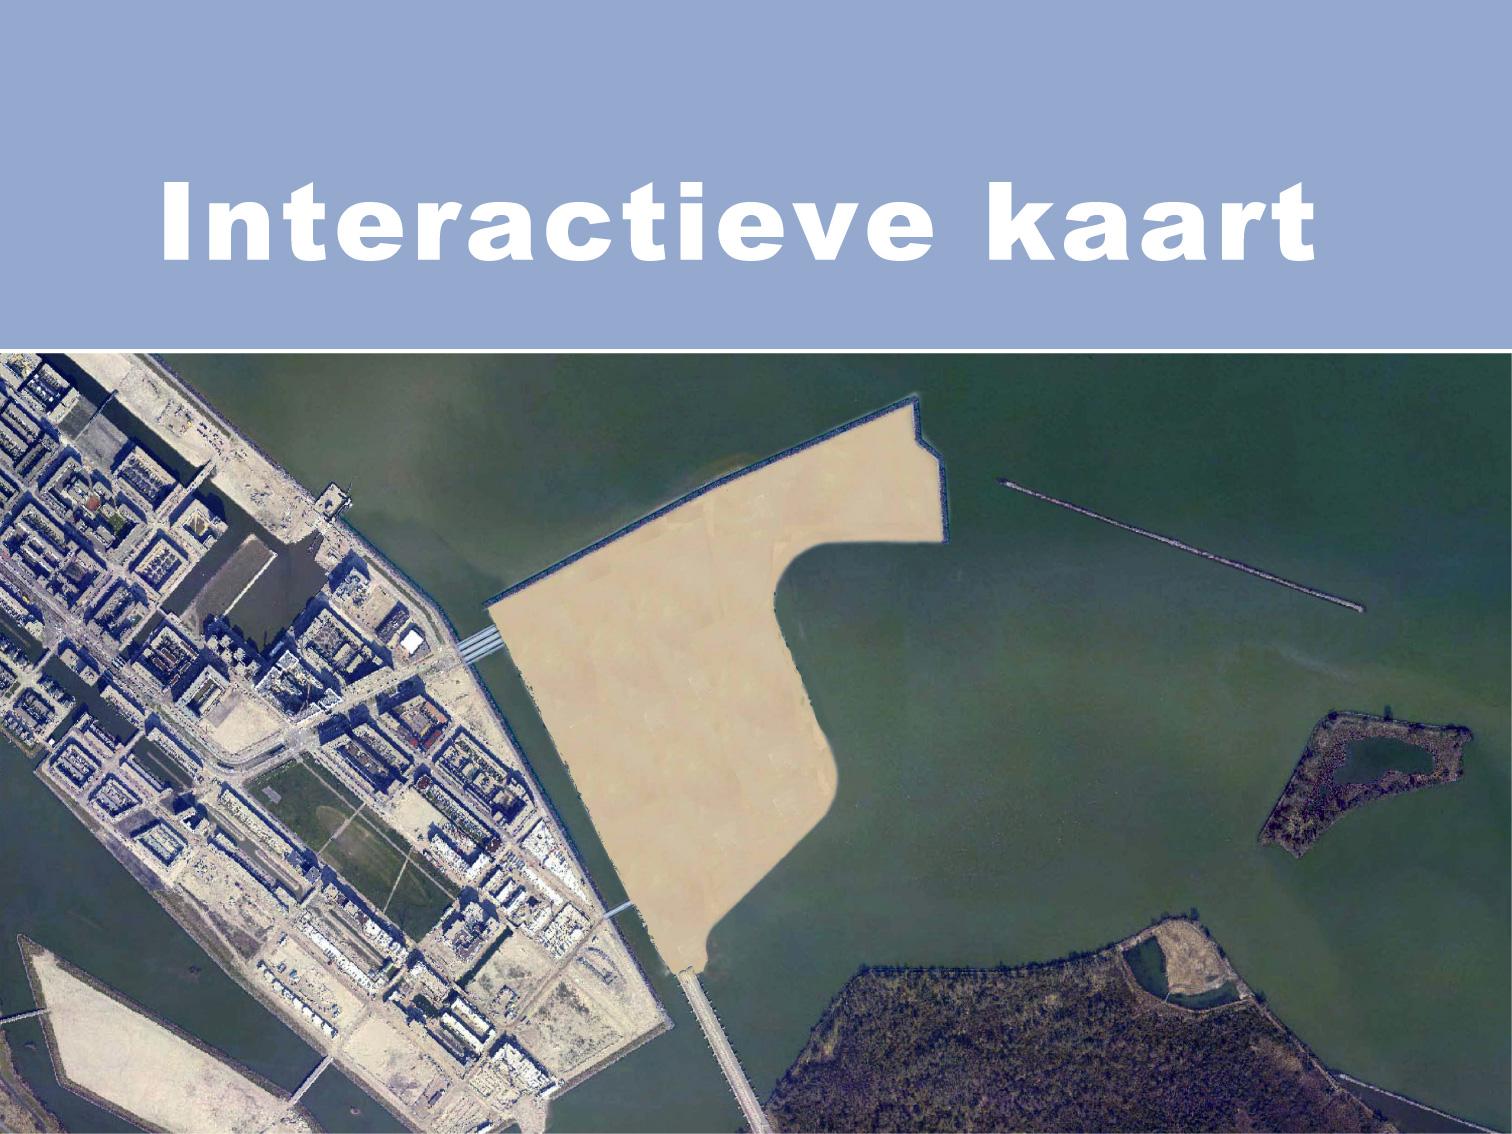 Interactieve kaart